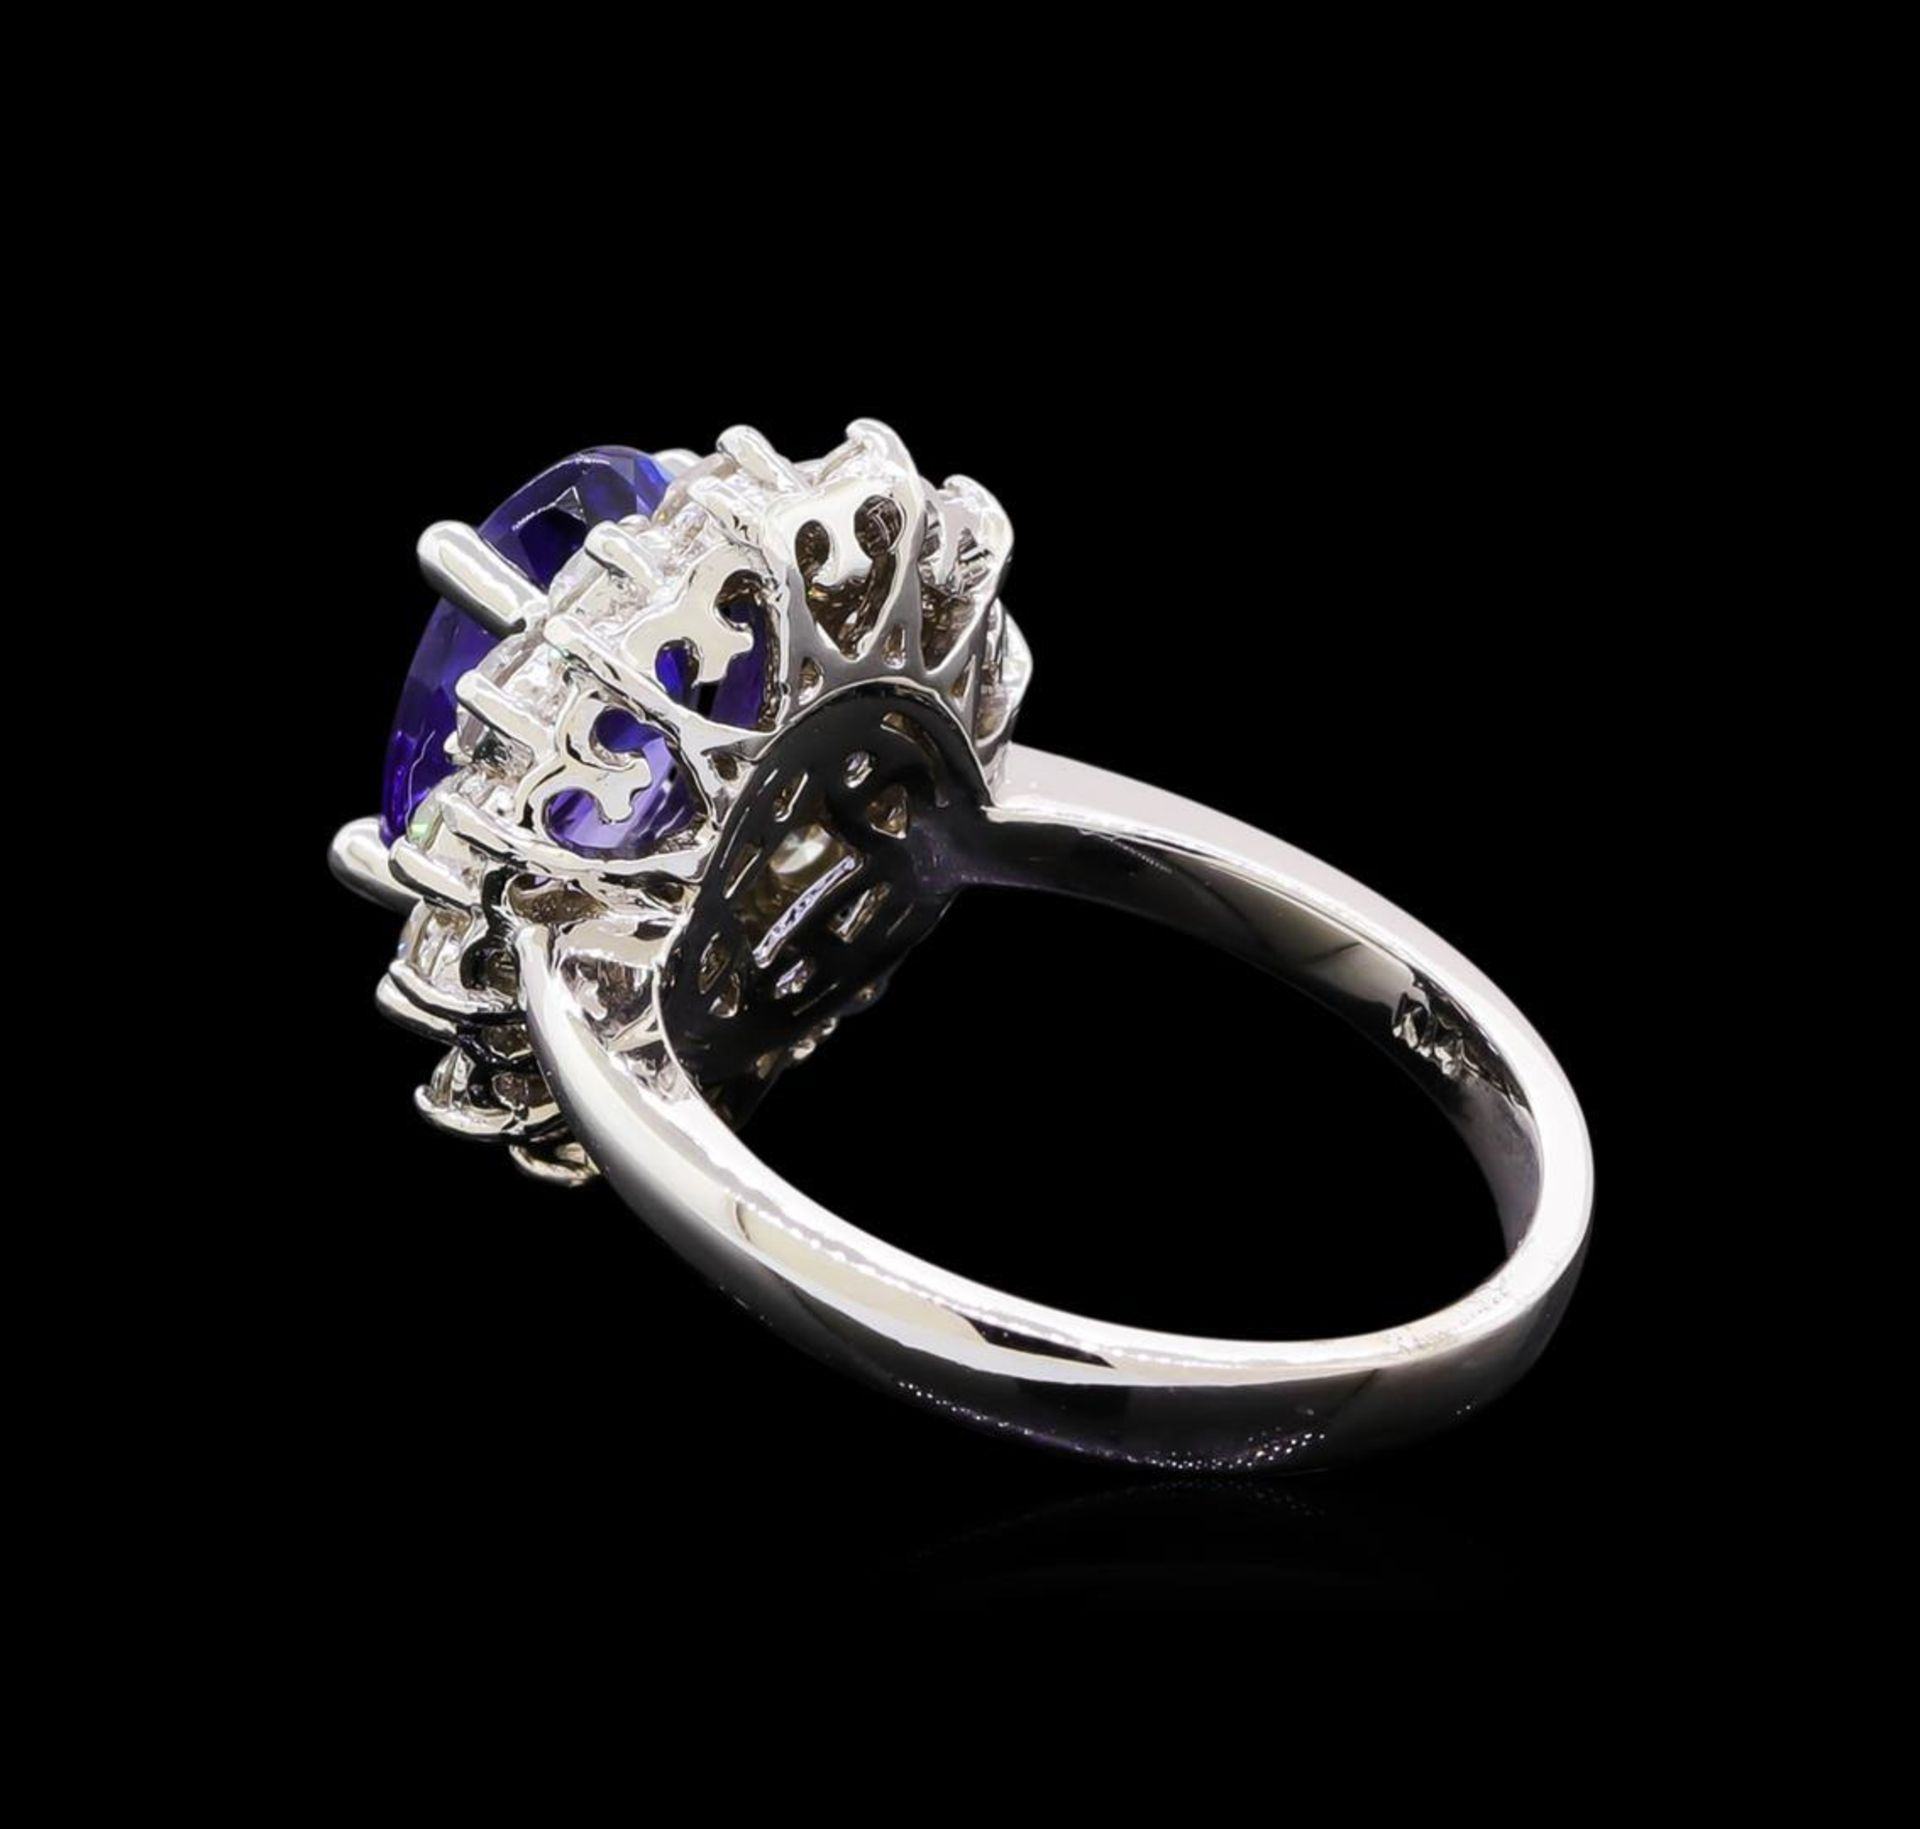 3.23 ctw Tanzanite and Diamond Ring - 14KT White Gold - Image 3 of 5